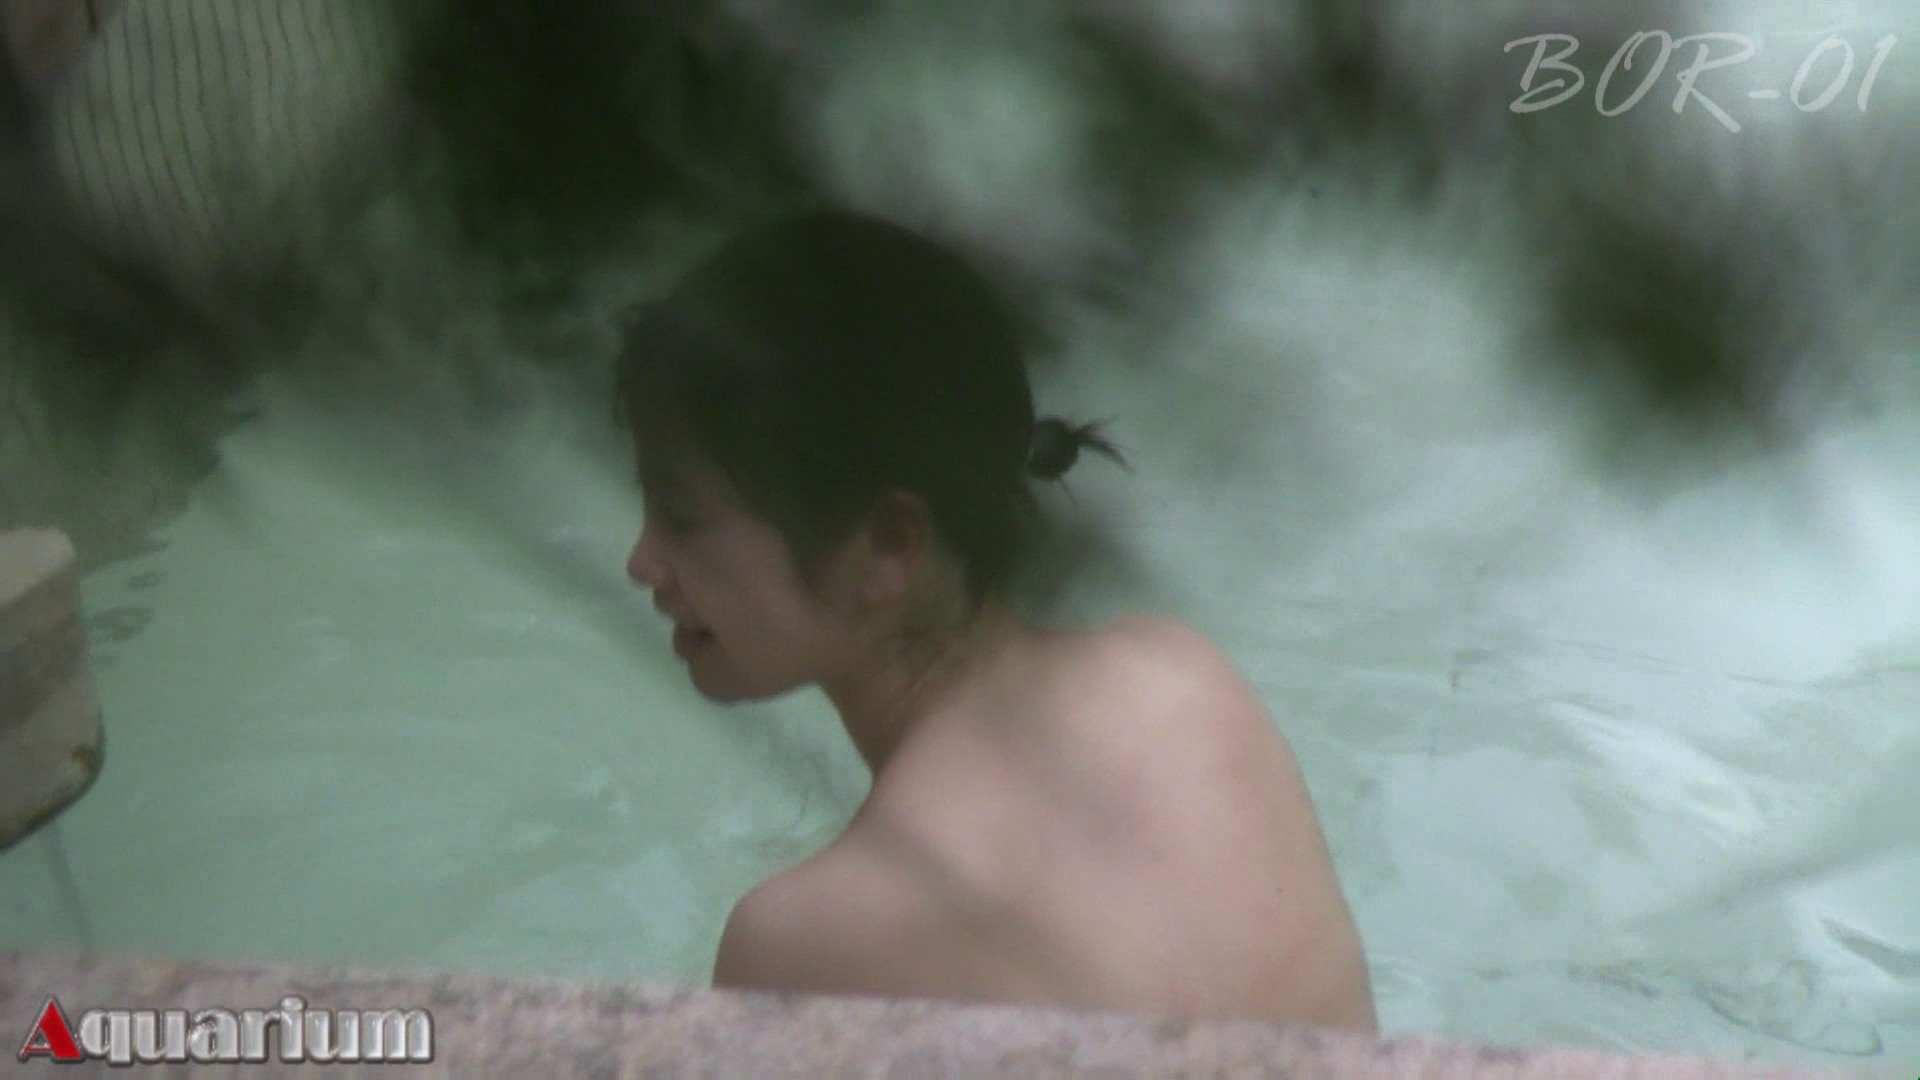 Aquaな露天風呂Vol.465 露天   OLセックス  51画像 37